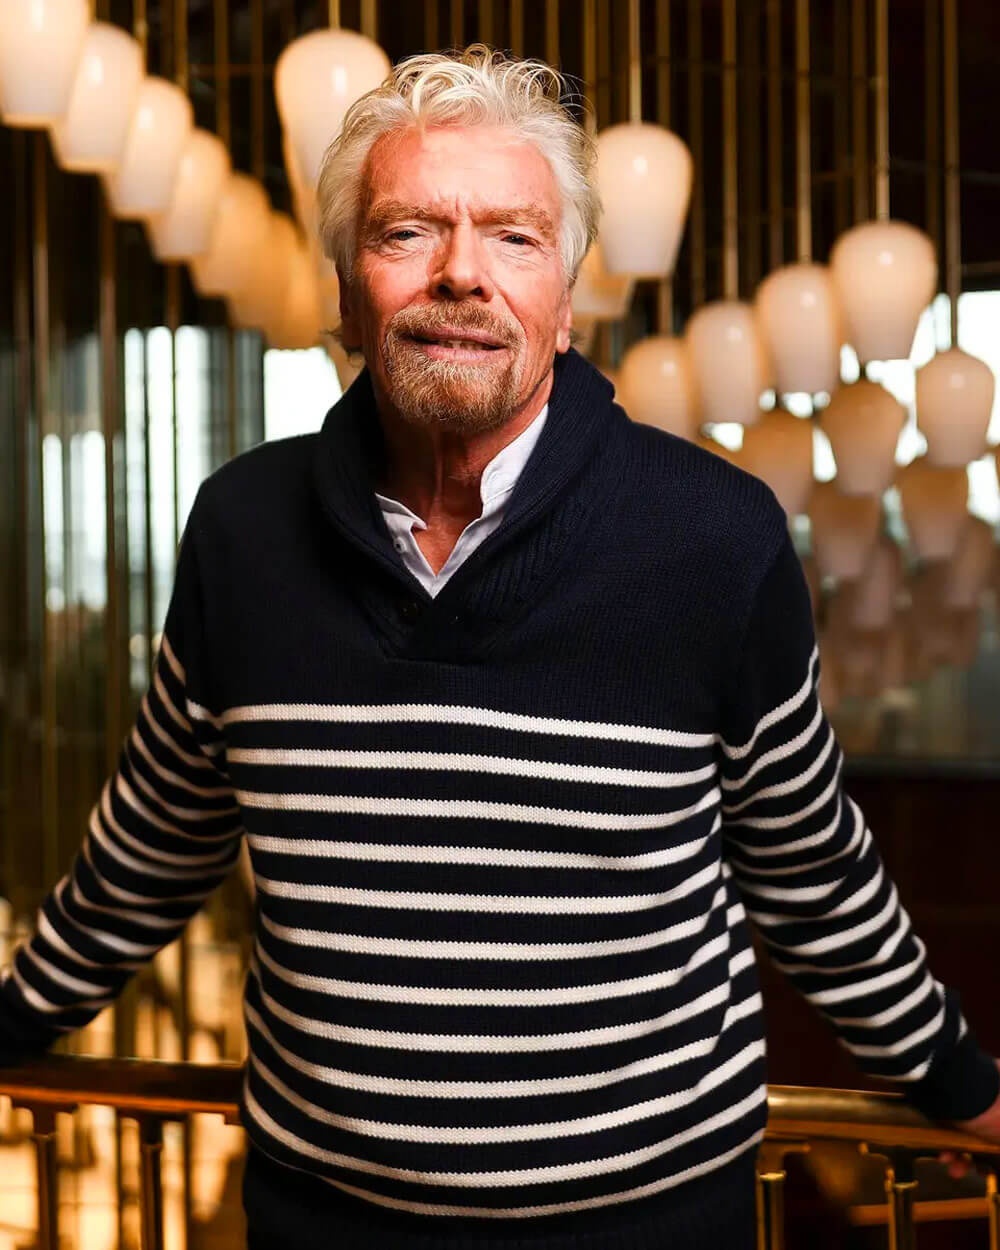 Sir Richard Branson Slow Fashion Celebrity